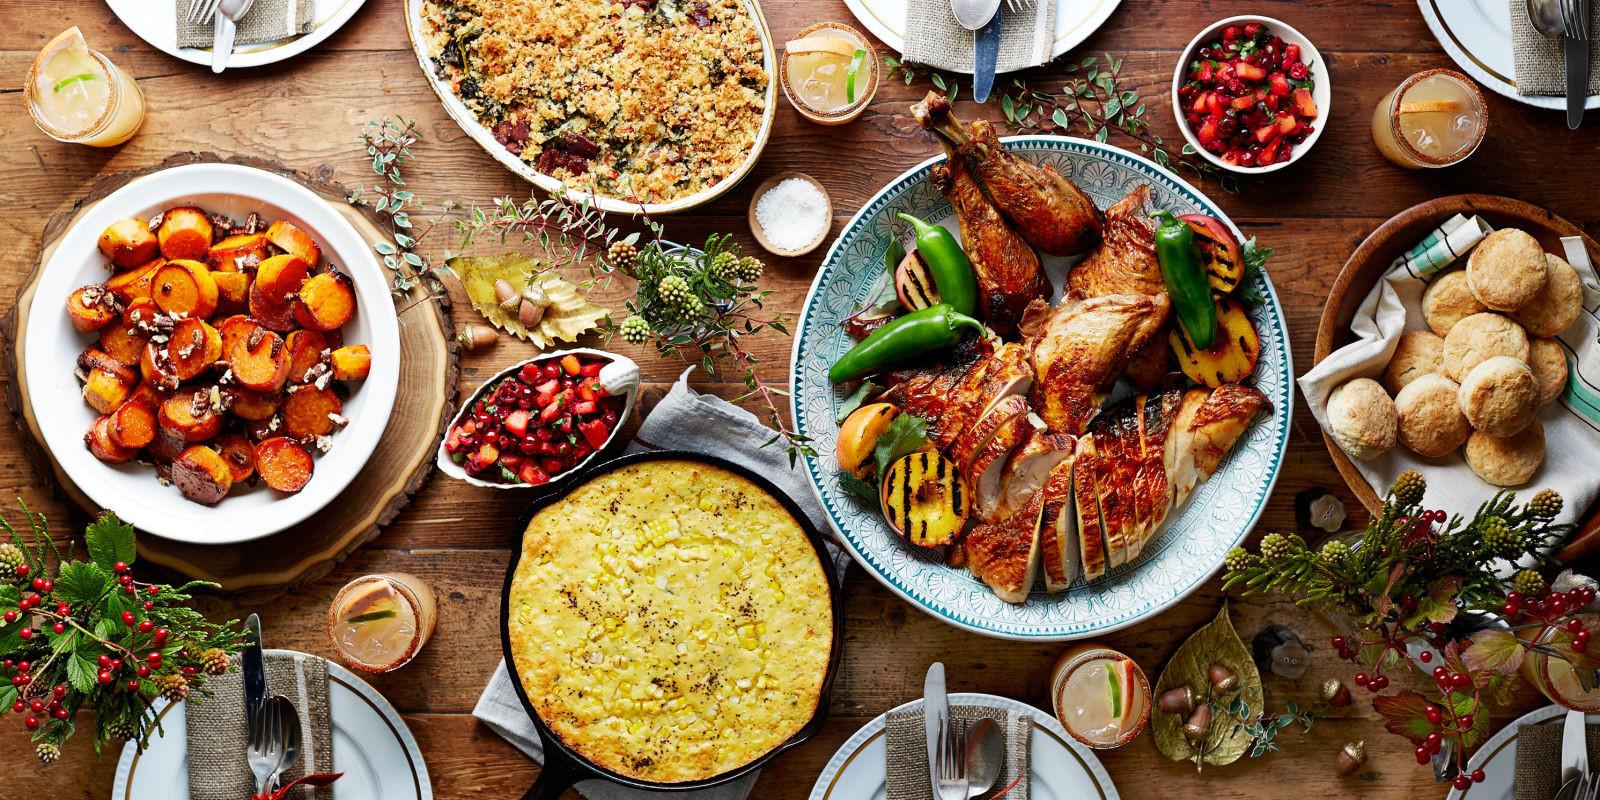 Thanksgiving Dinner Ideas Pinterest  Pinterest Thanksgiving Menu Top Thanksgiving Recipes on